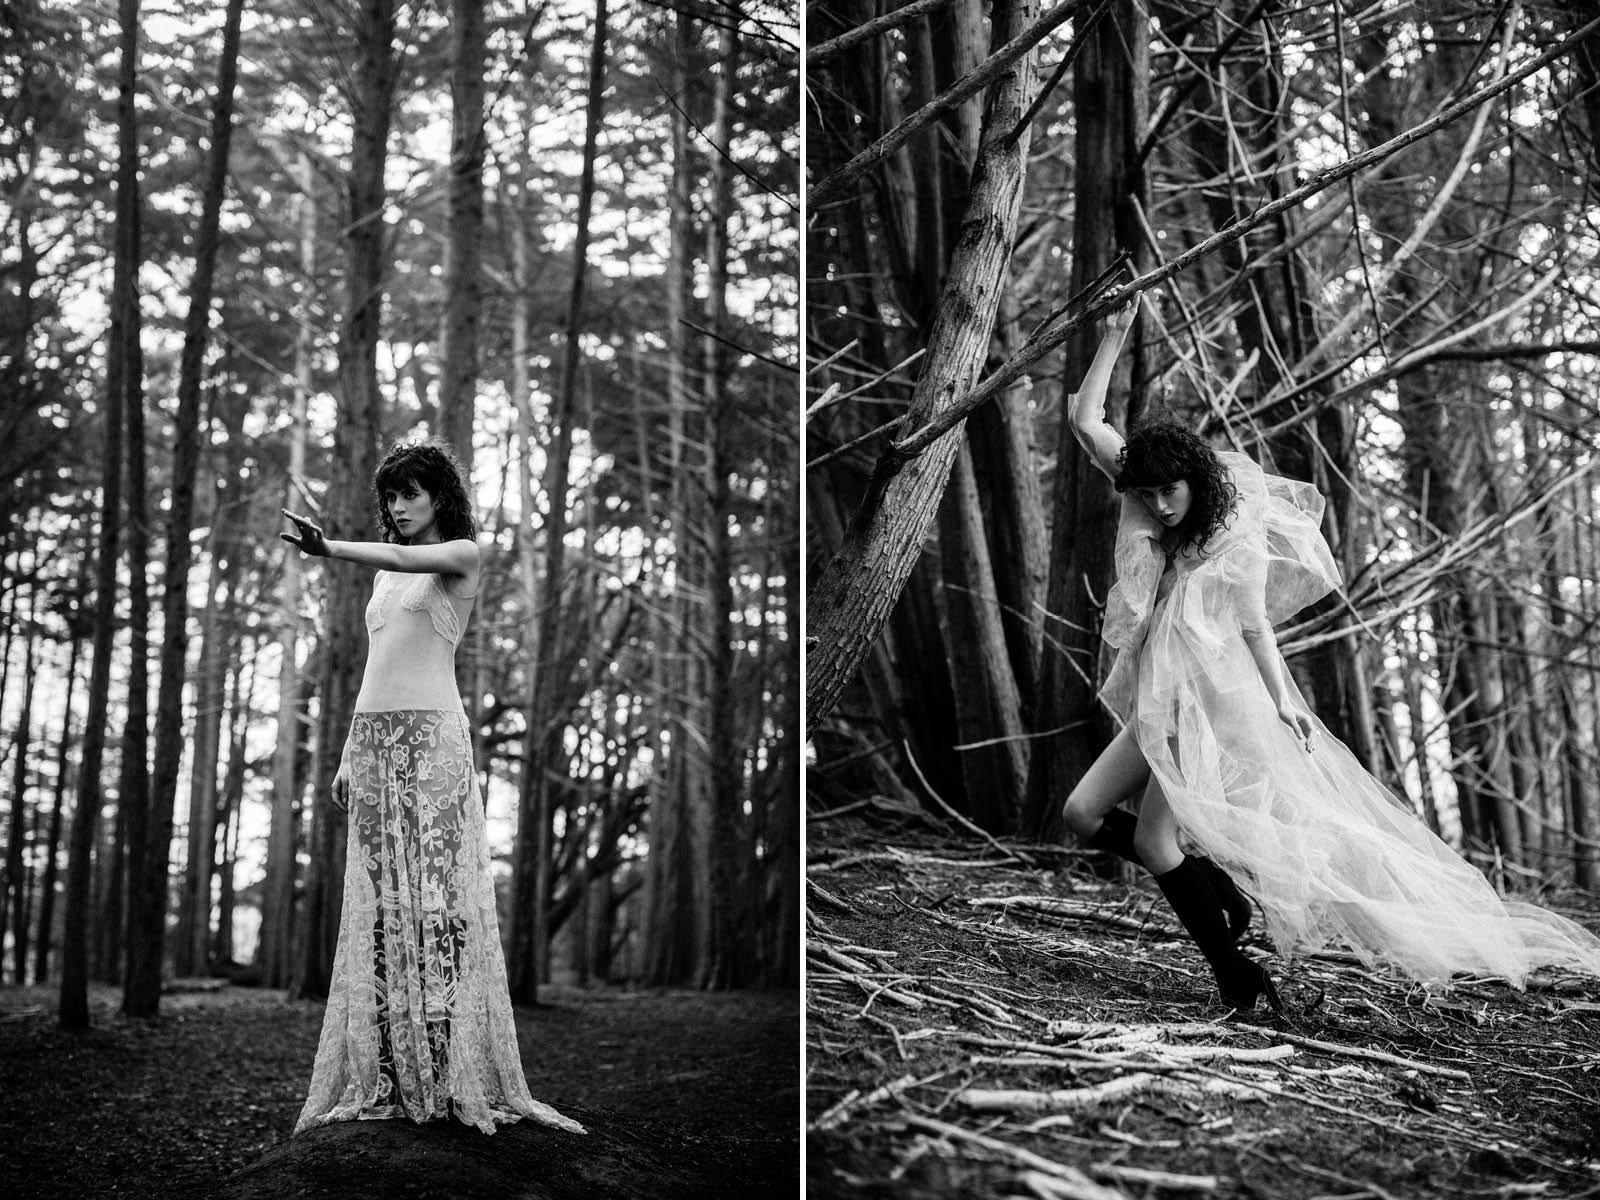 Spirit-&-Fles_MAGYARUL-DANCE_by_Matt-Licari_5